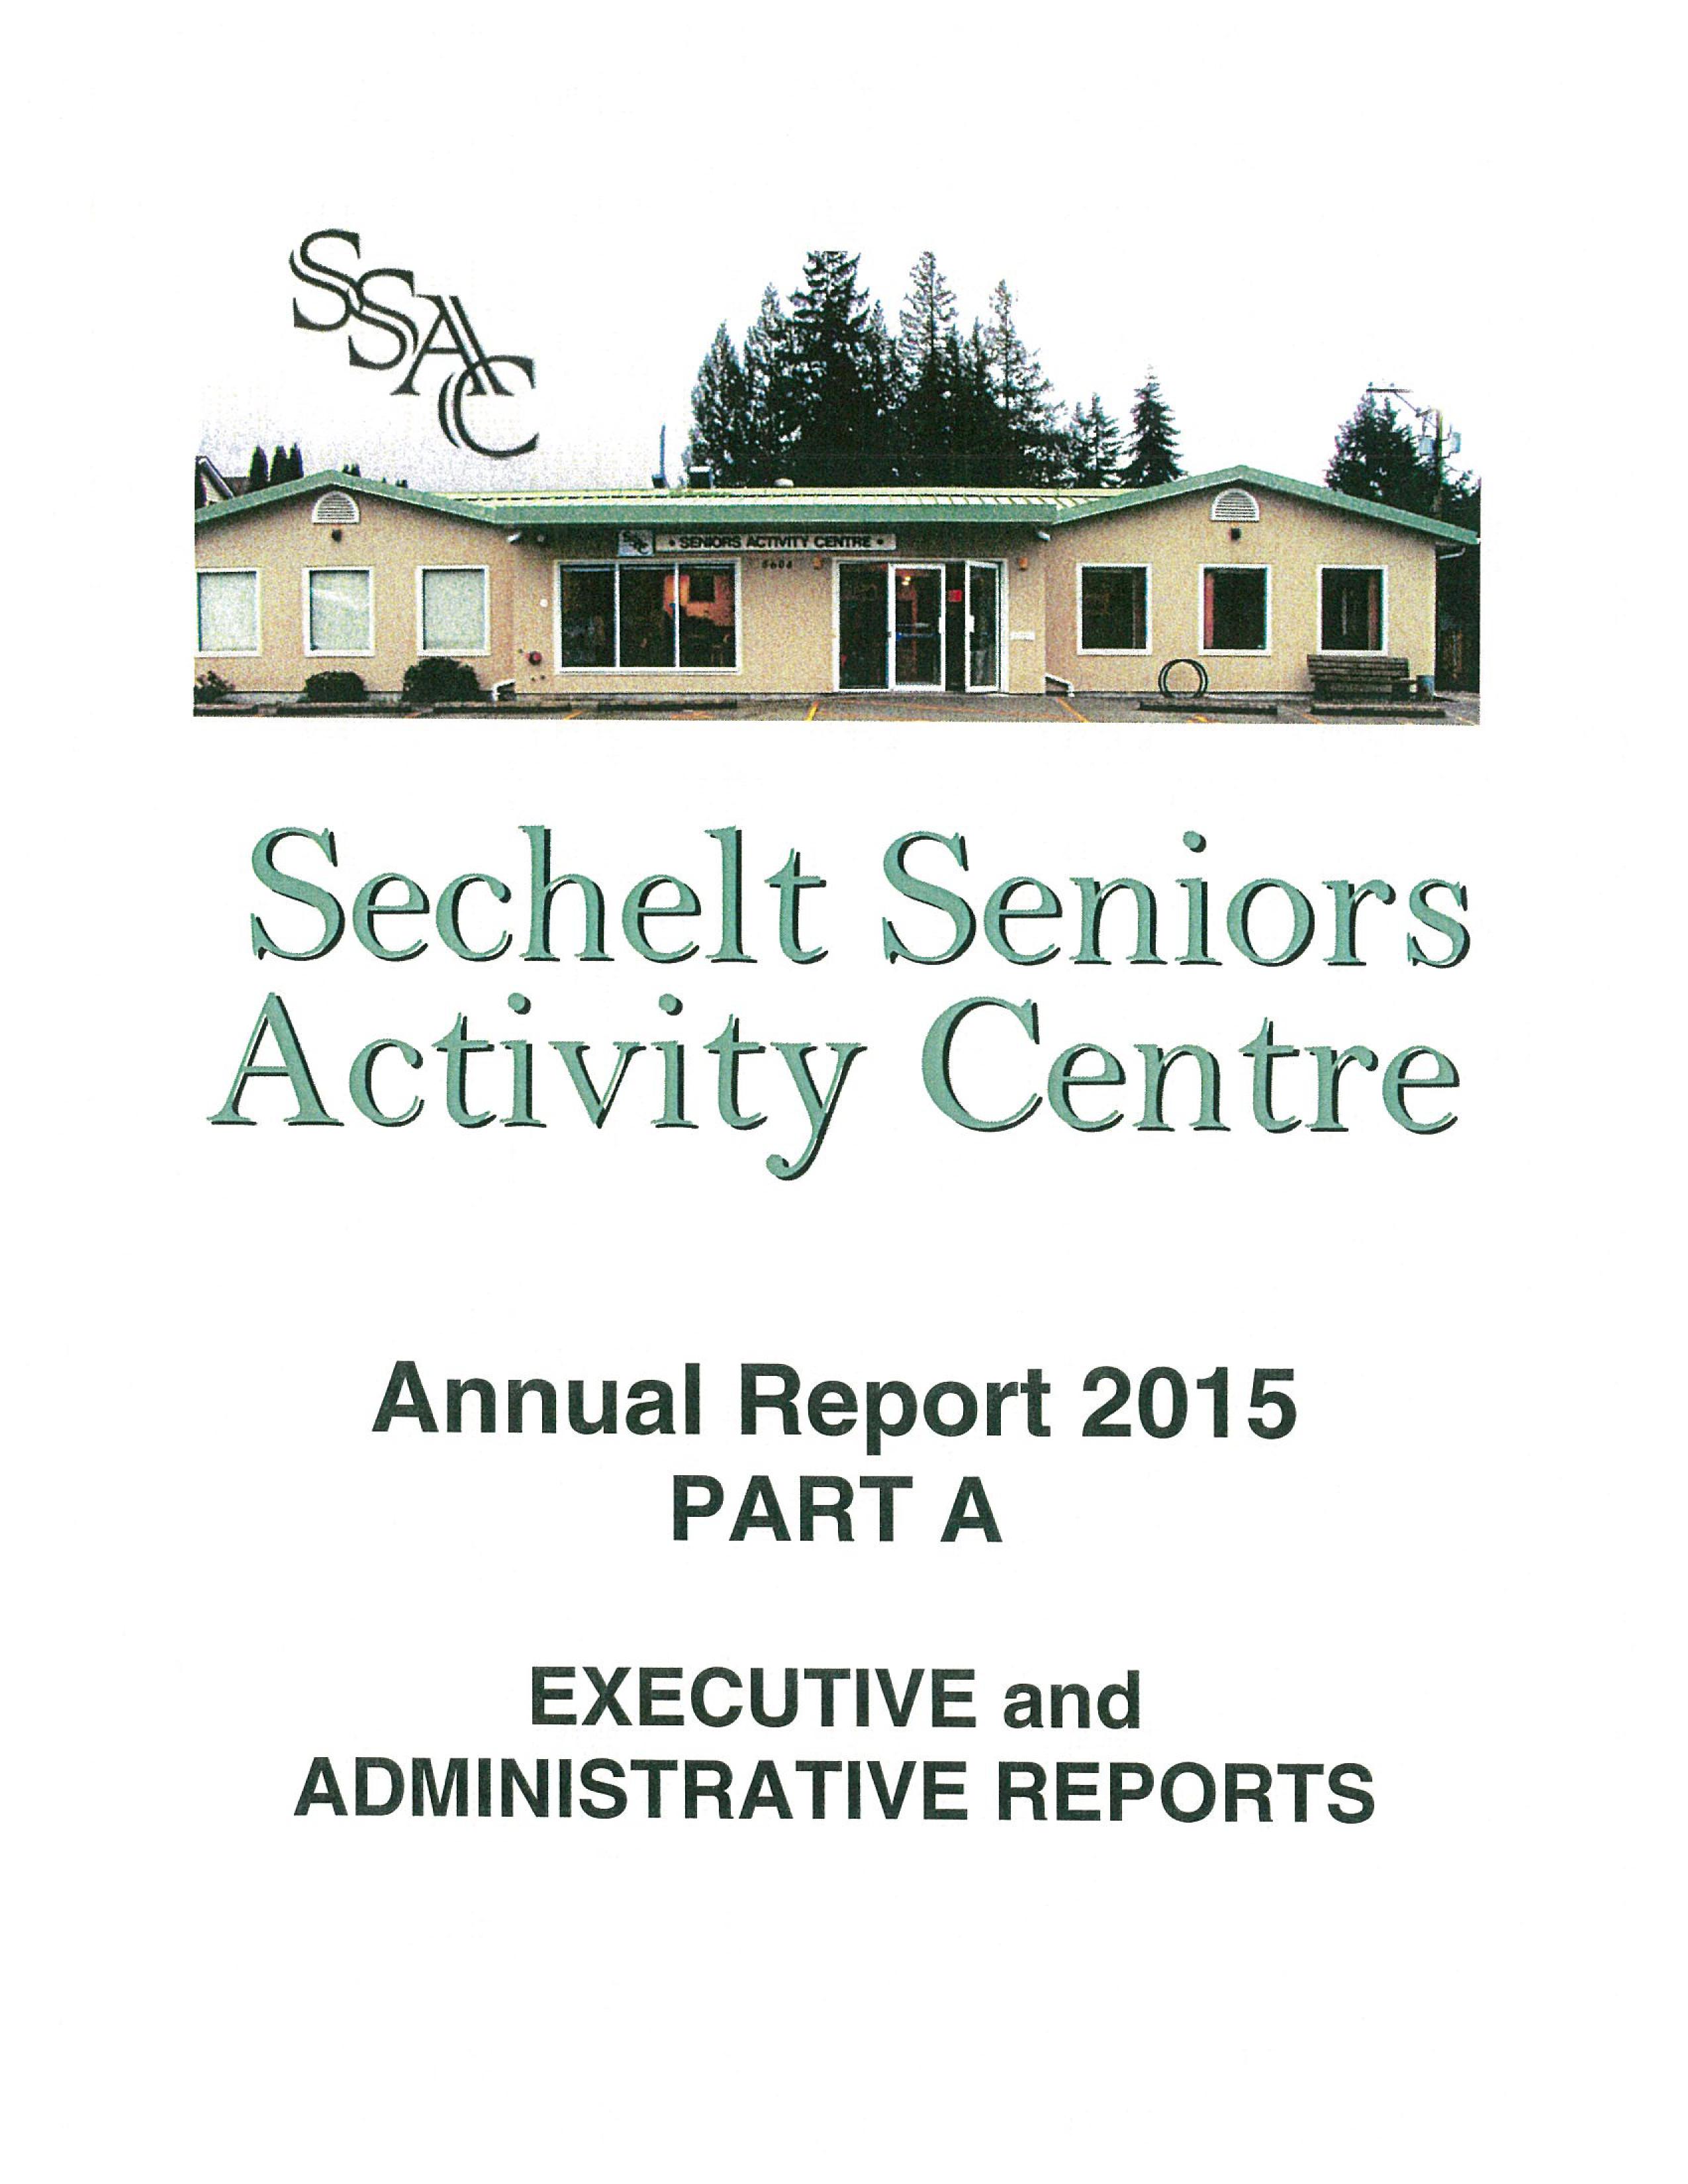 SSAC ANNUAL REPORT 2015-1